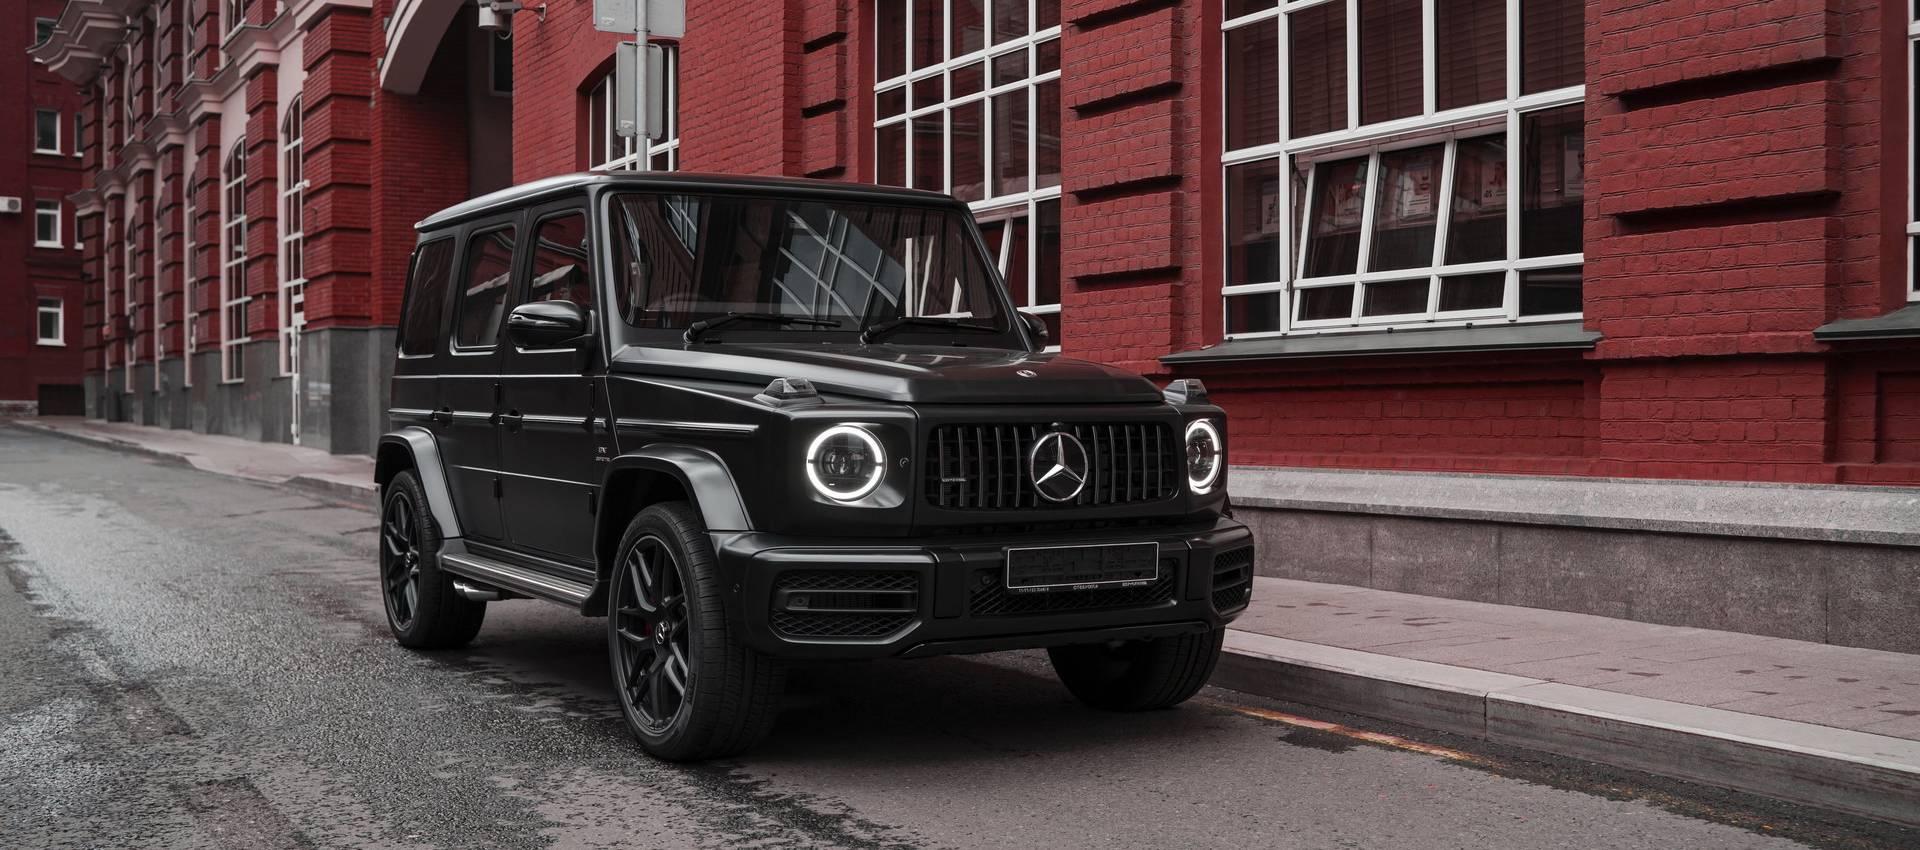 Аренда Mercedes G 63 AMG в Москве